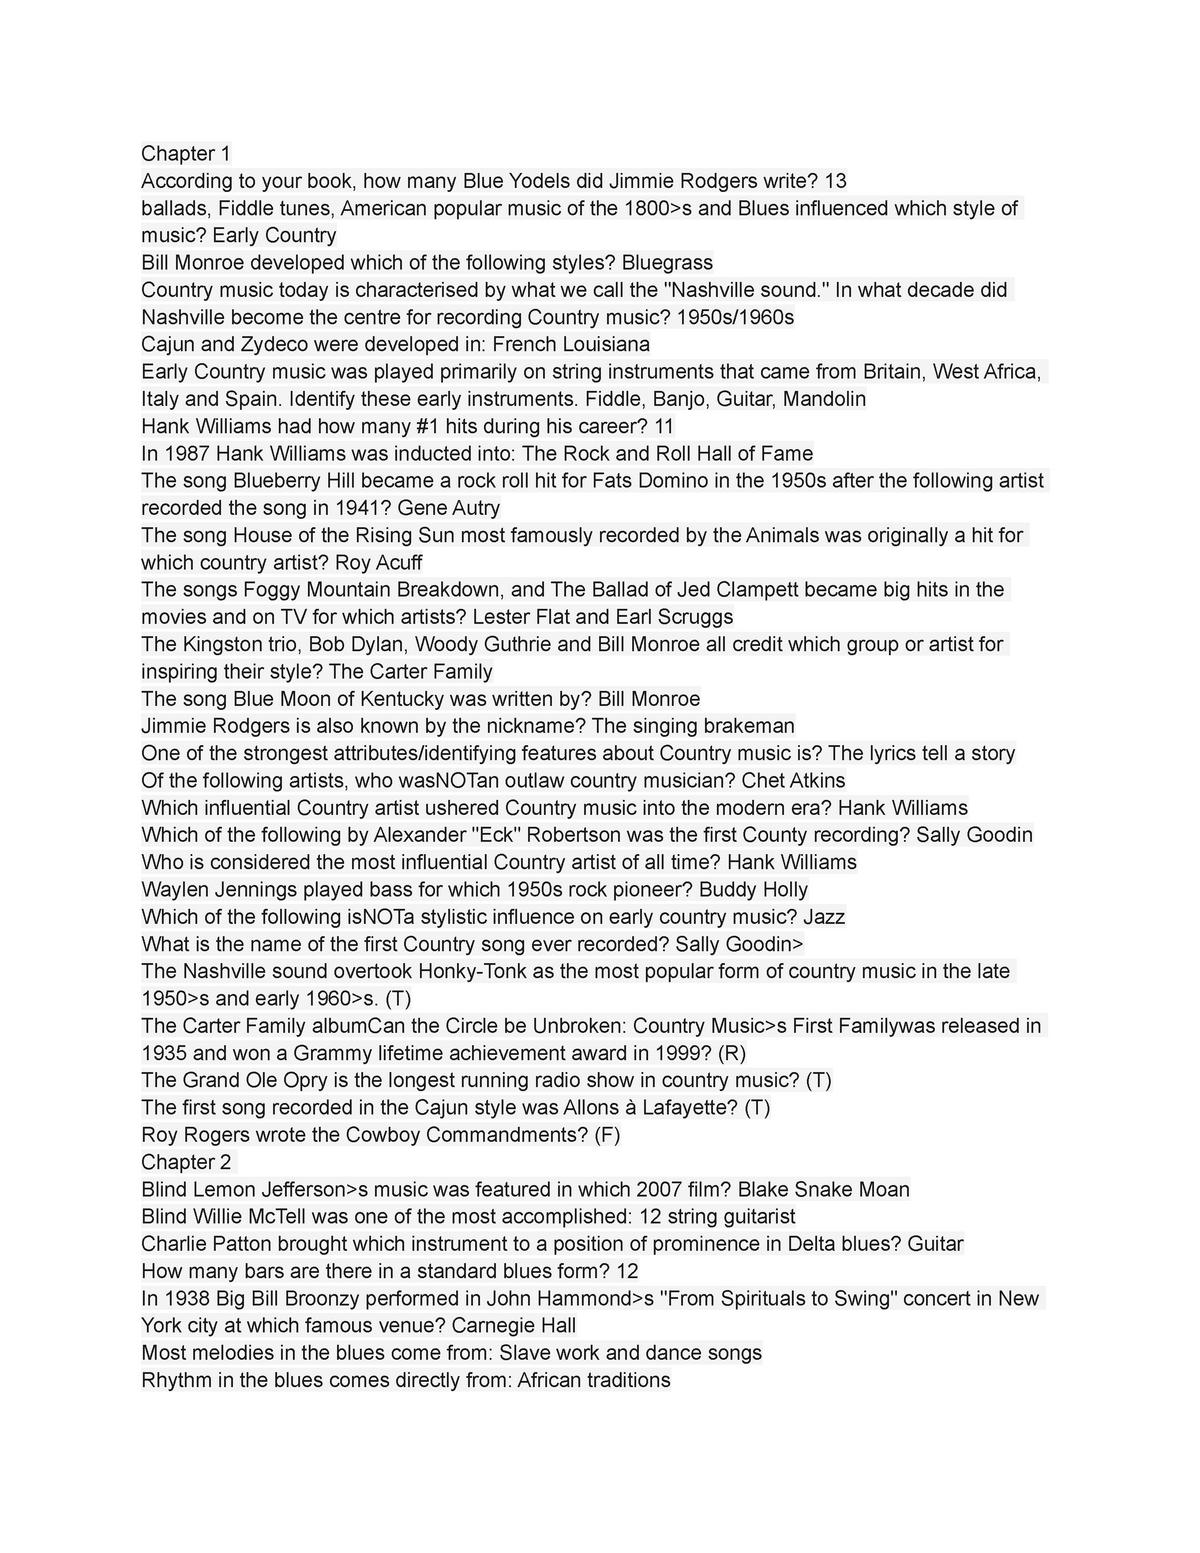 MUS 125 - QUIZ ANSWERS - MUS 125 History Of Rock Music - StuDocu